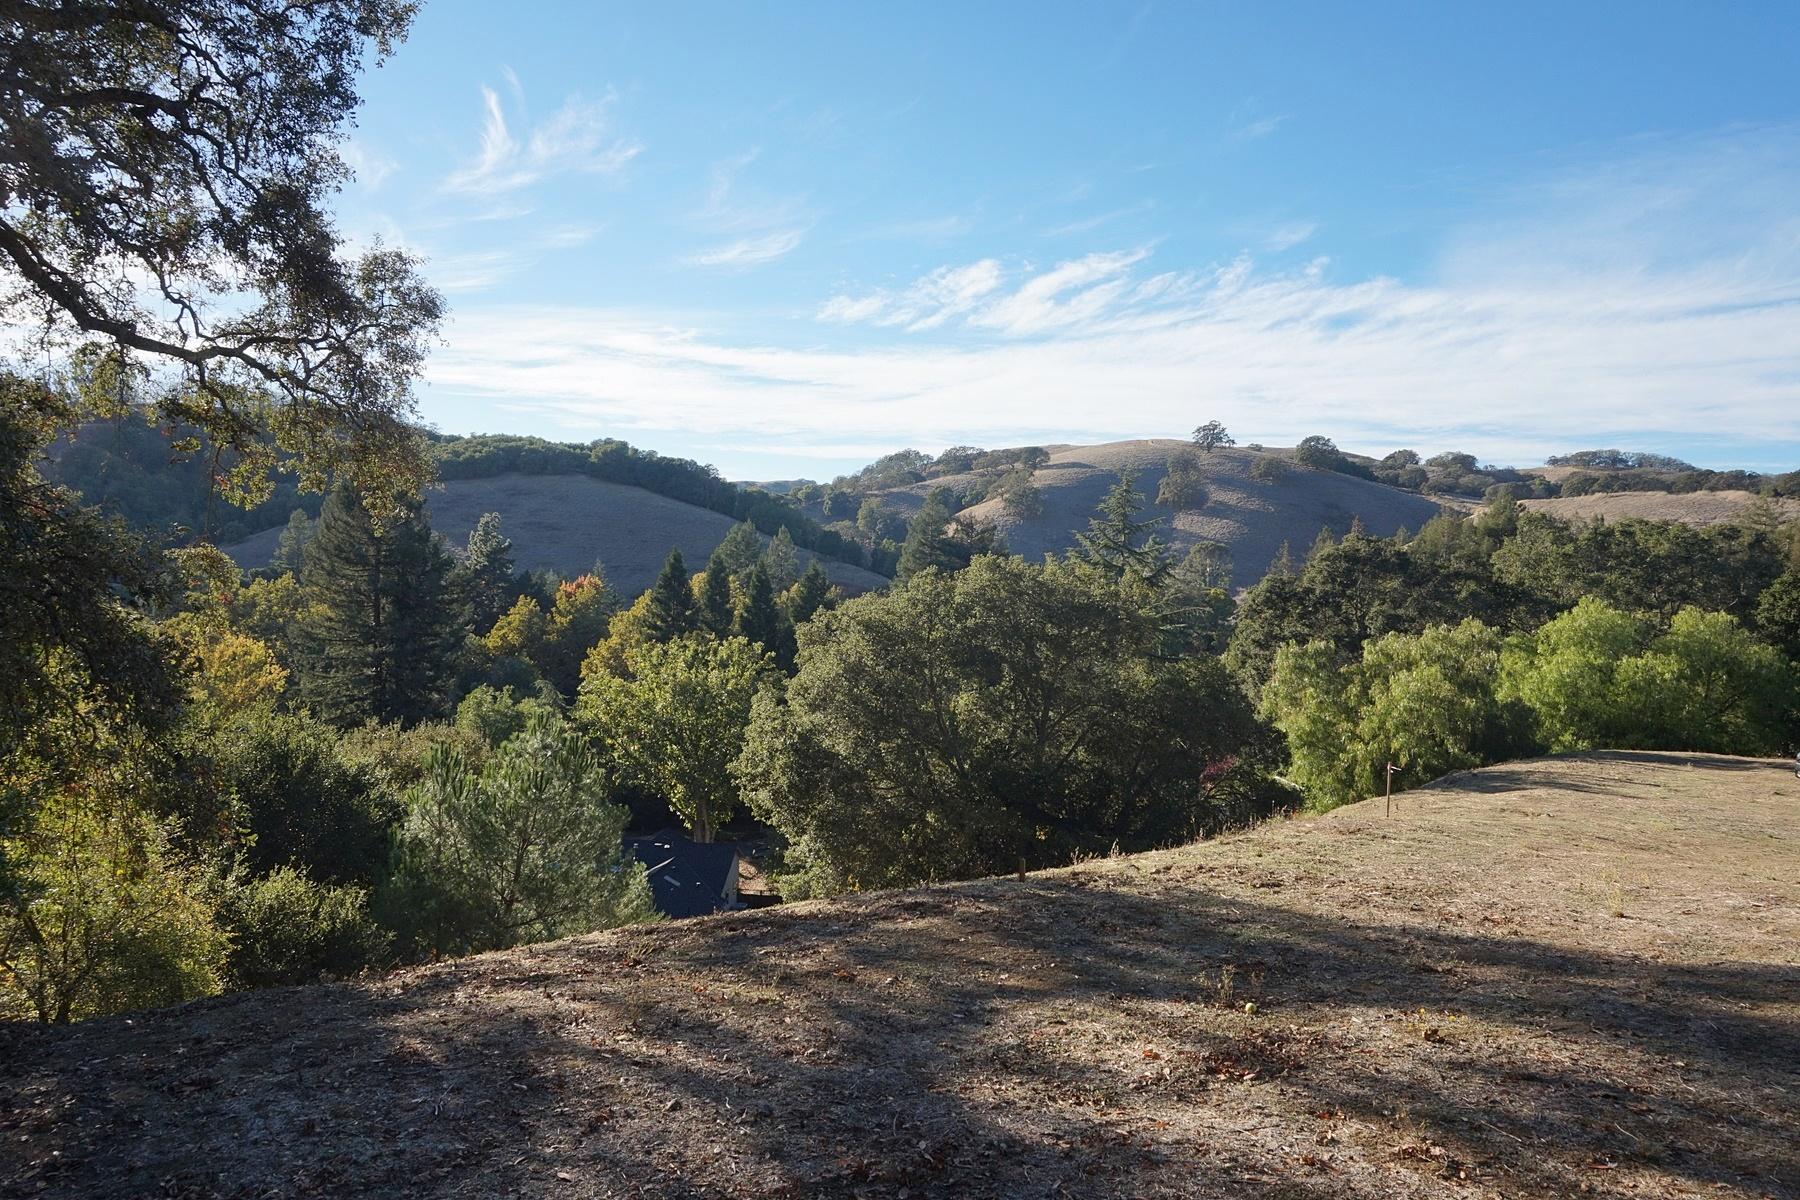 Terreno por un Venta en Private Lot With Whimsical Views 0 Wanda Way Martinez, California 94553 Estados Unidos